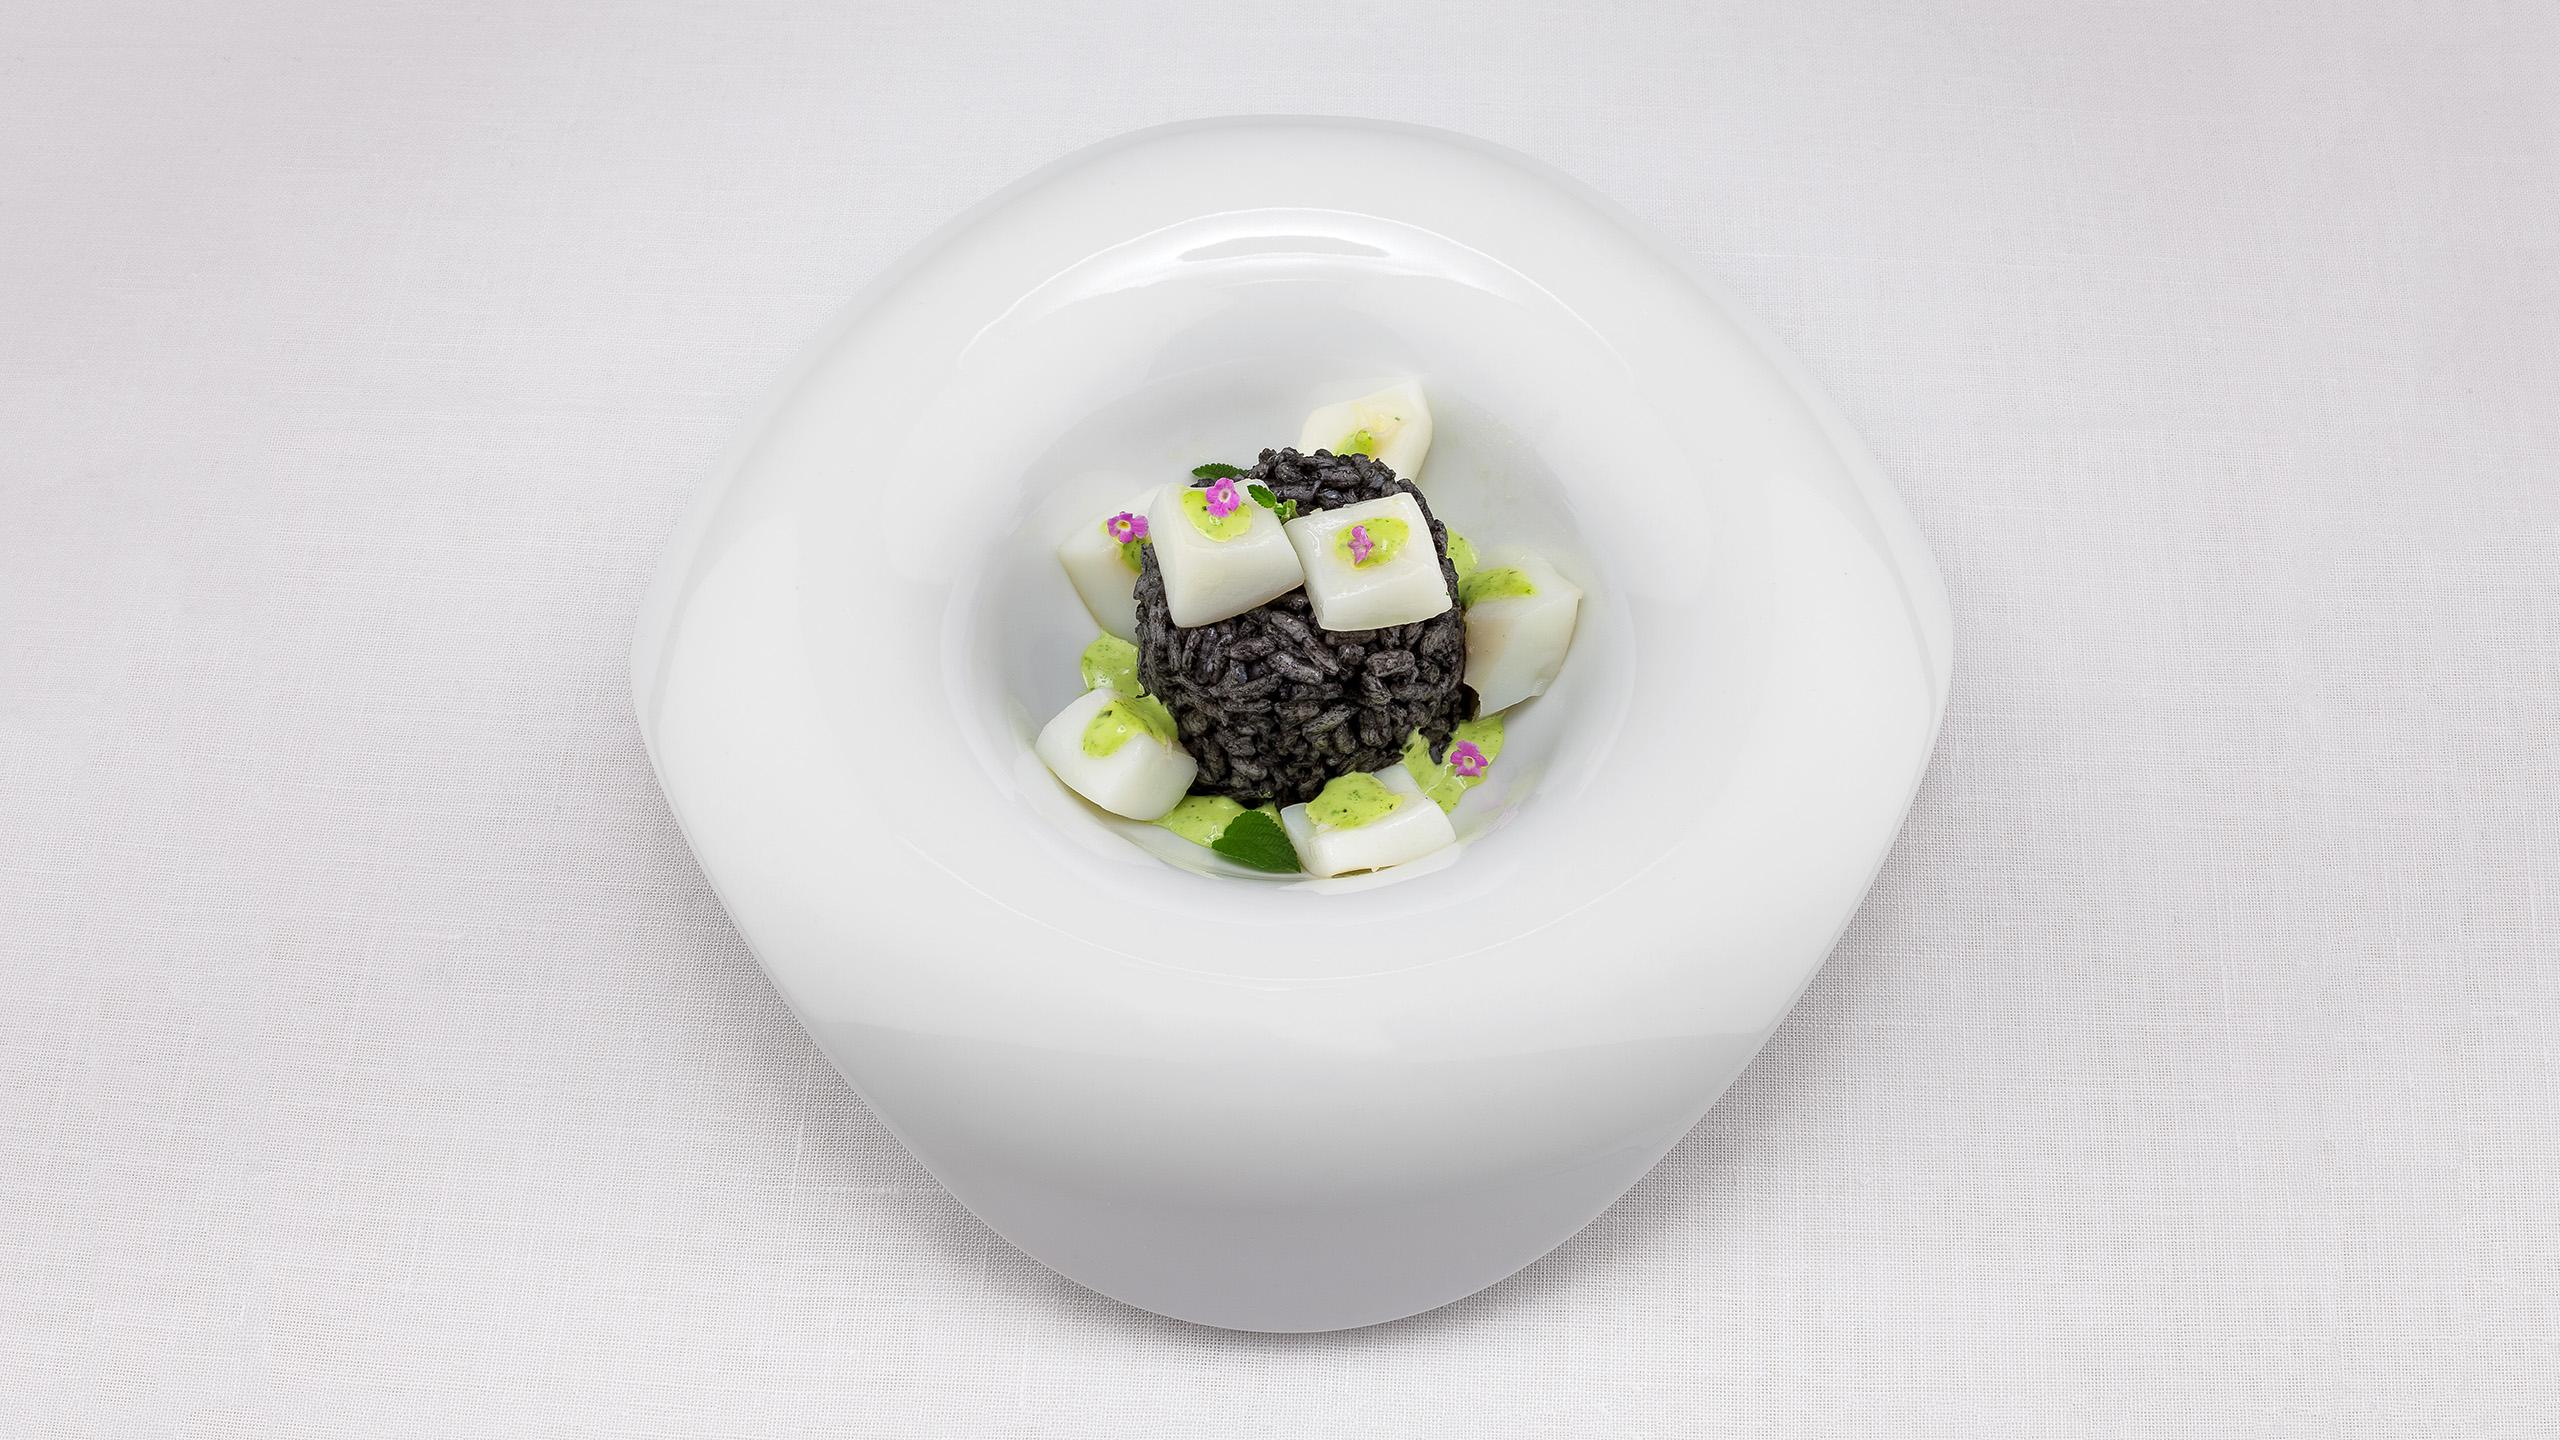 gastronomia 50 profand